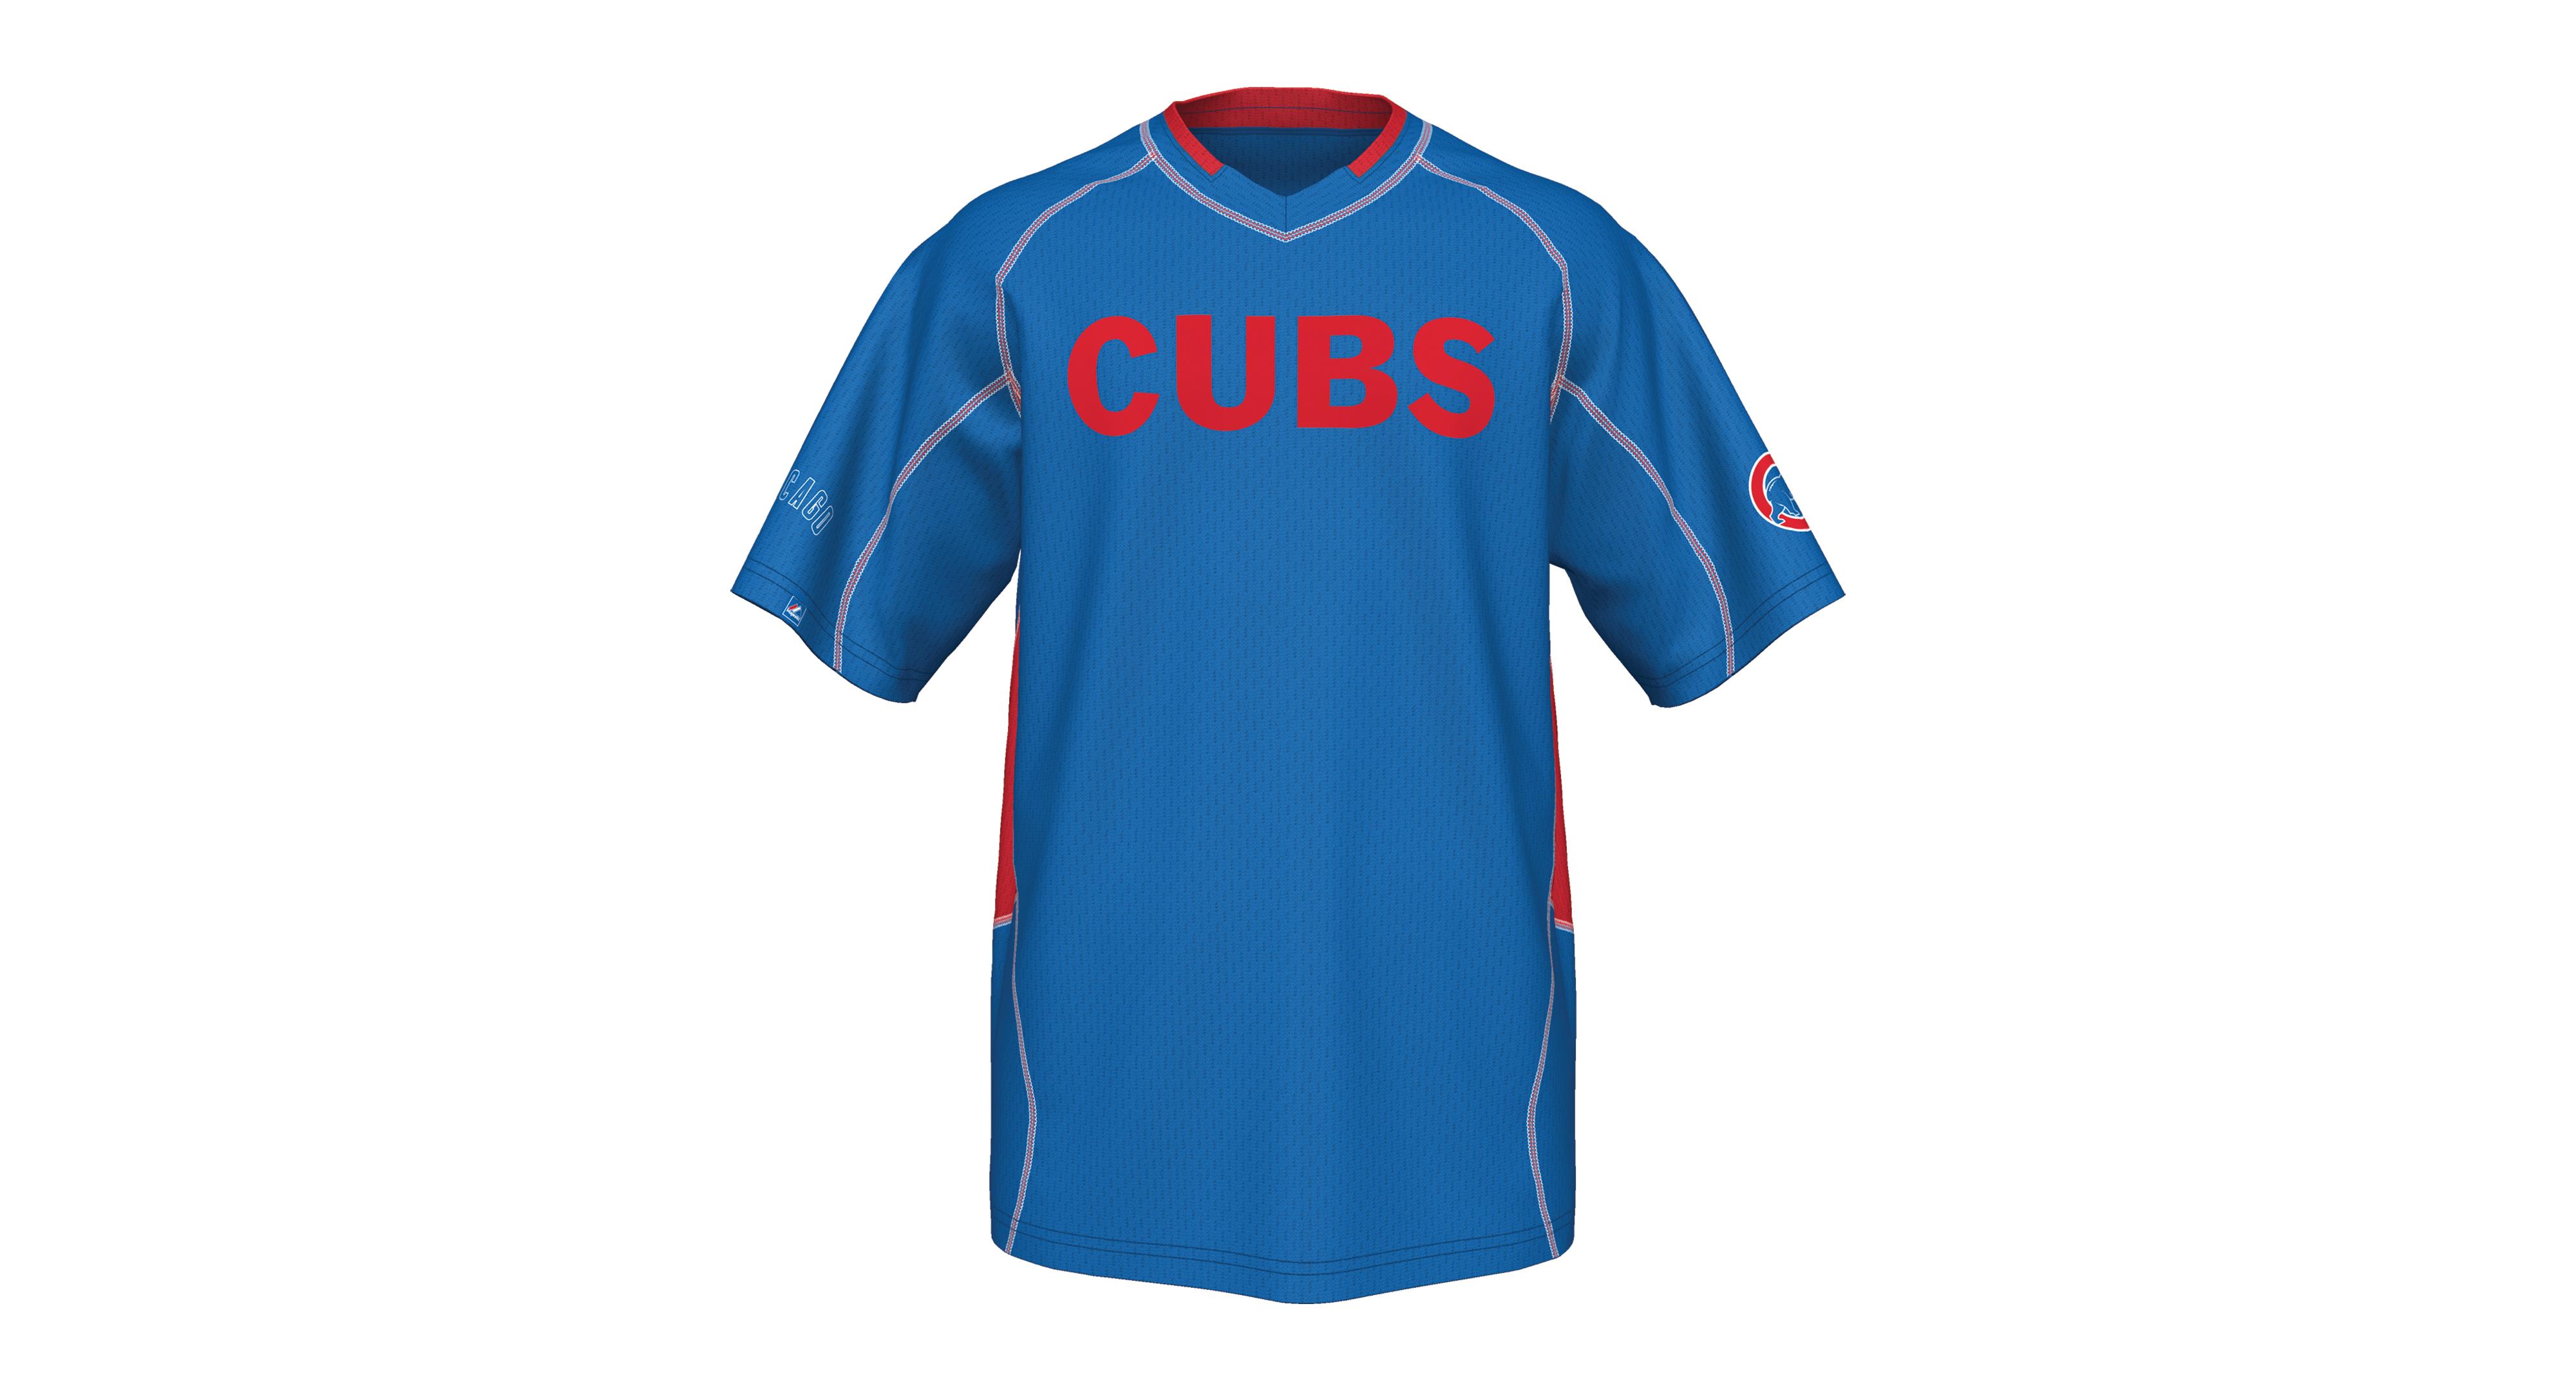 Majestic Men's Chicago Cubs Fast Action T-Shirt